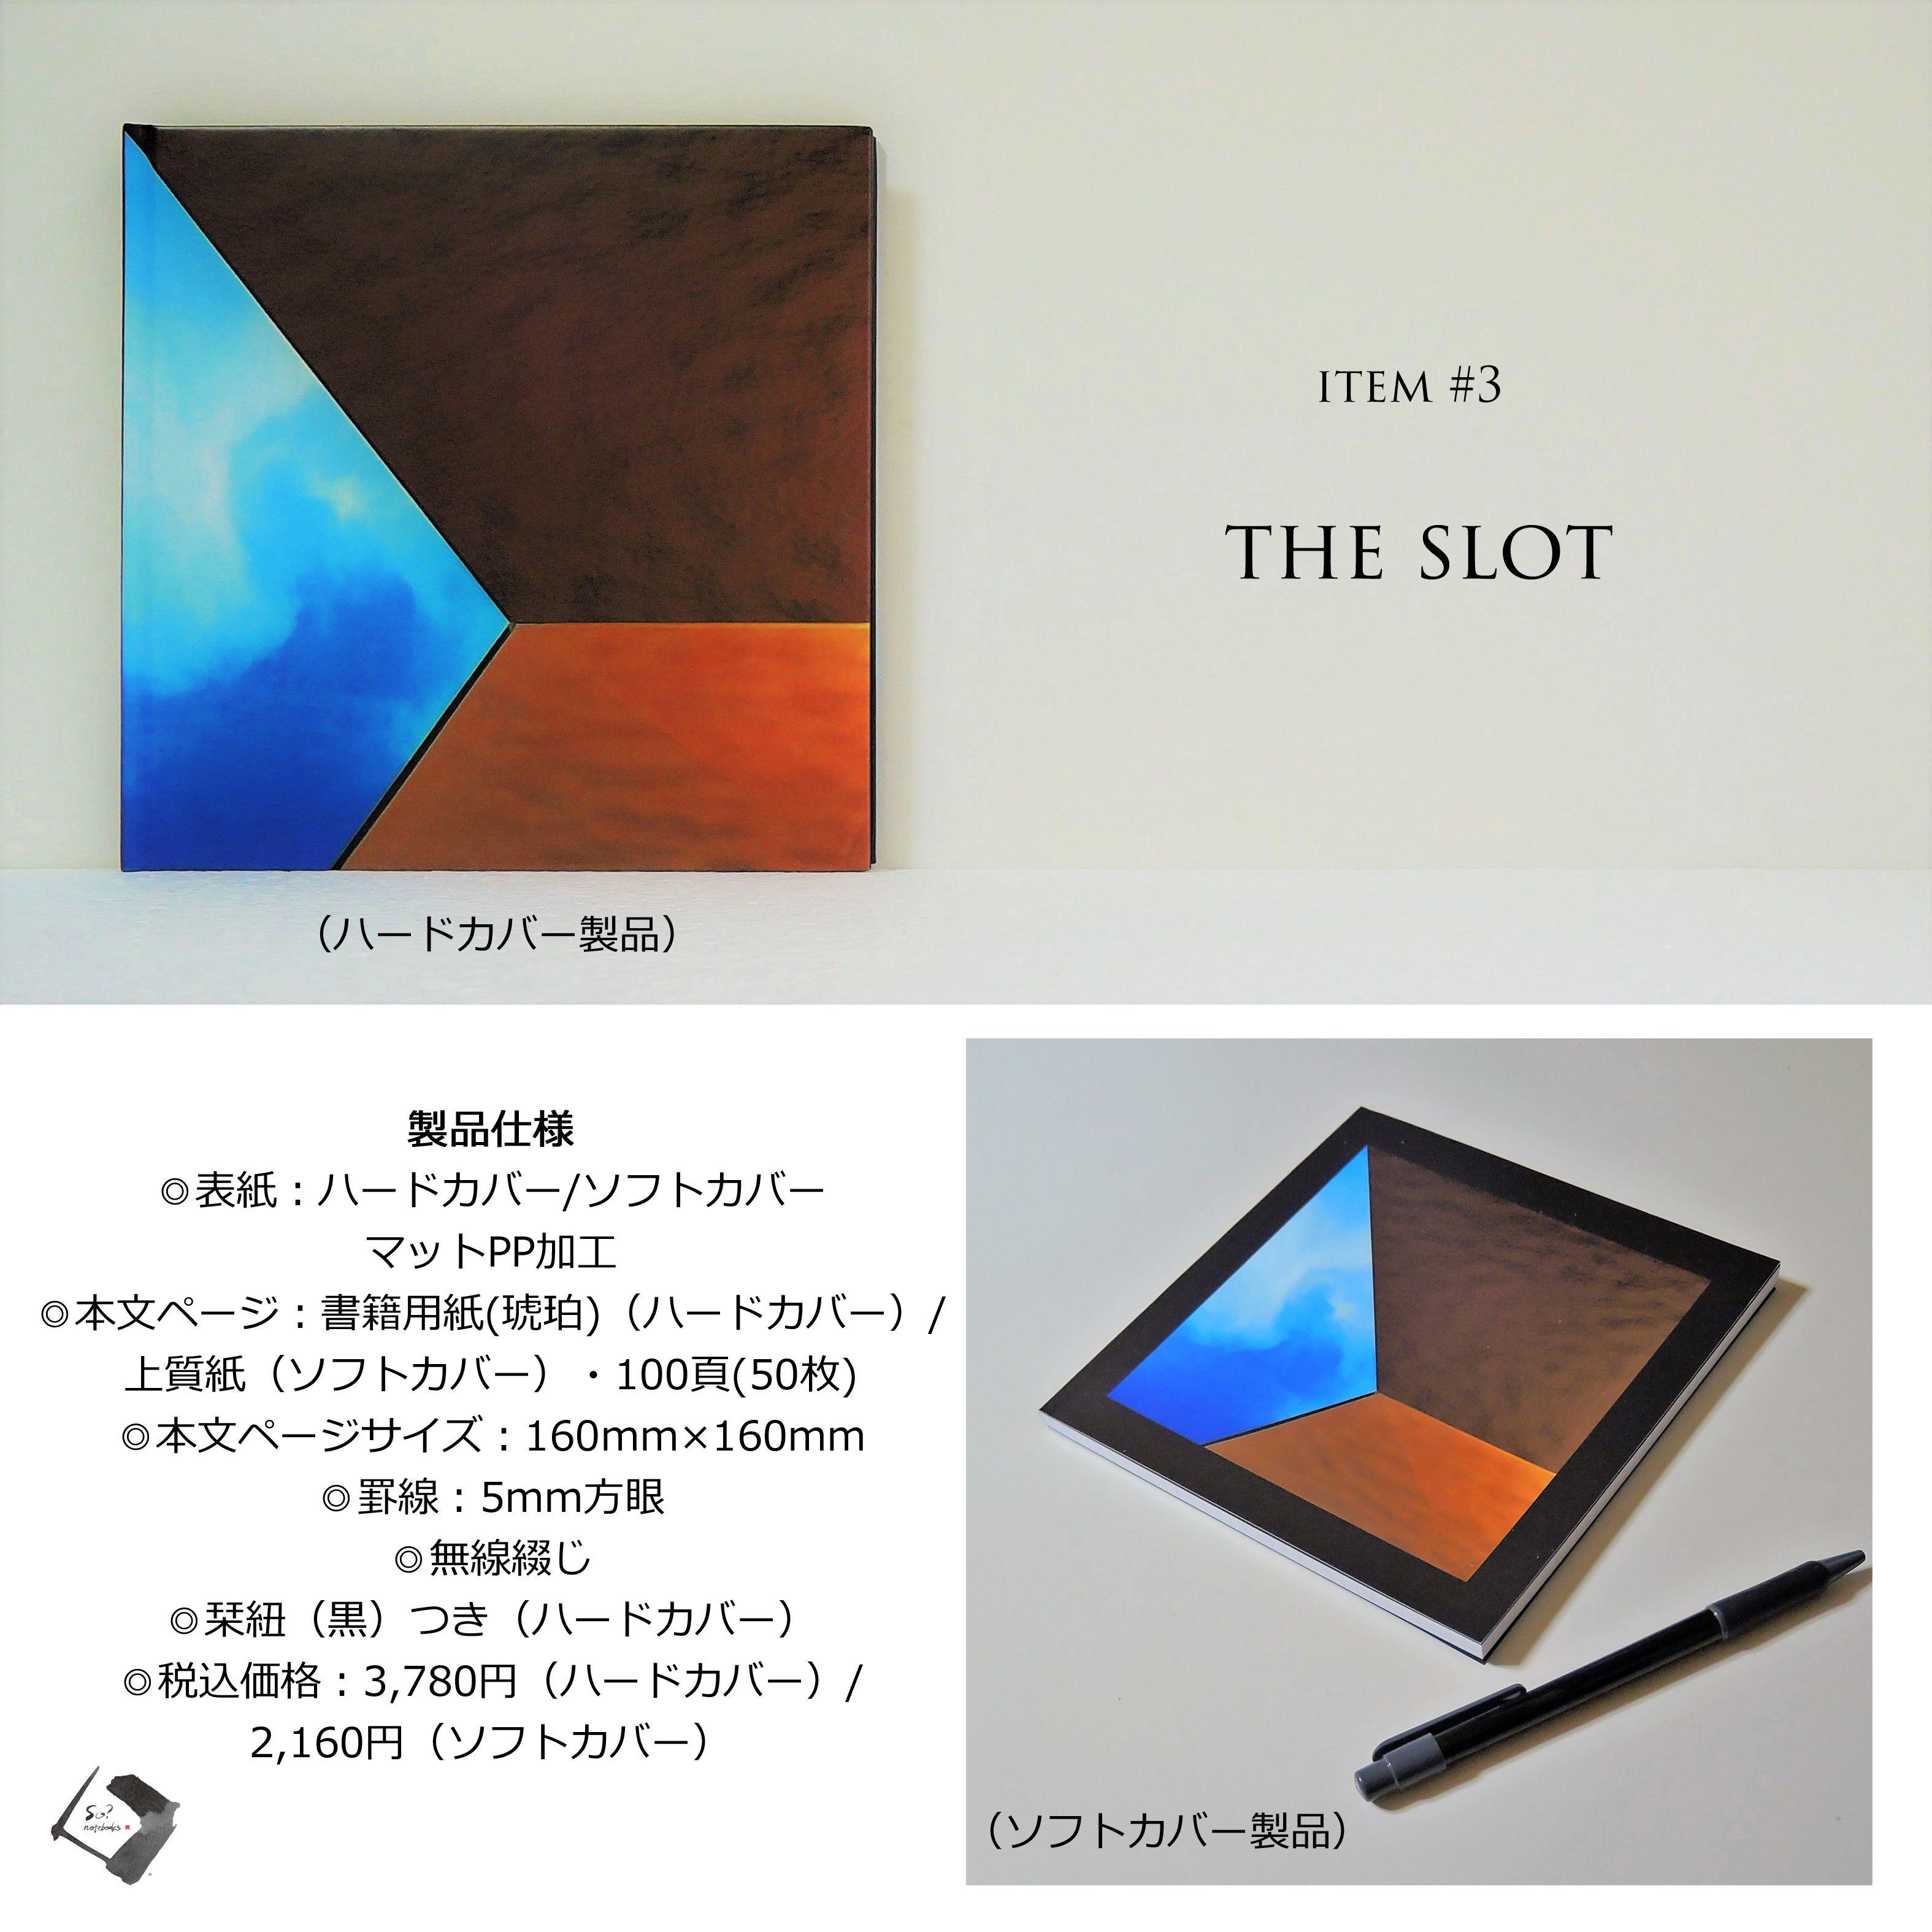 notebook #stationery #ノート #文房具 #かわいい #かっこいい #design